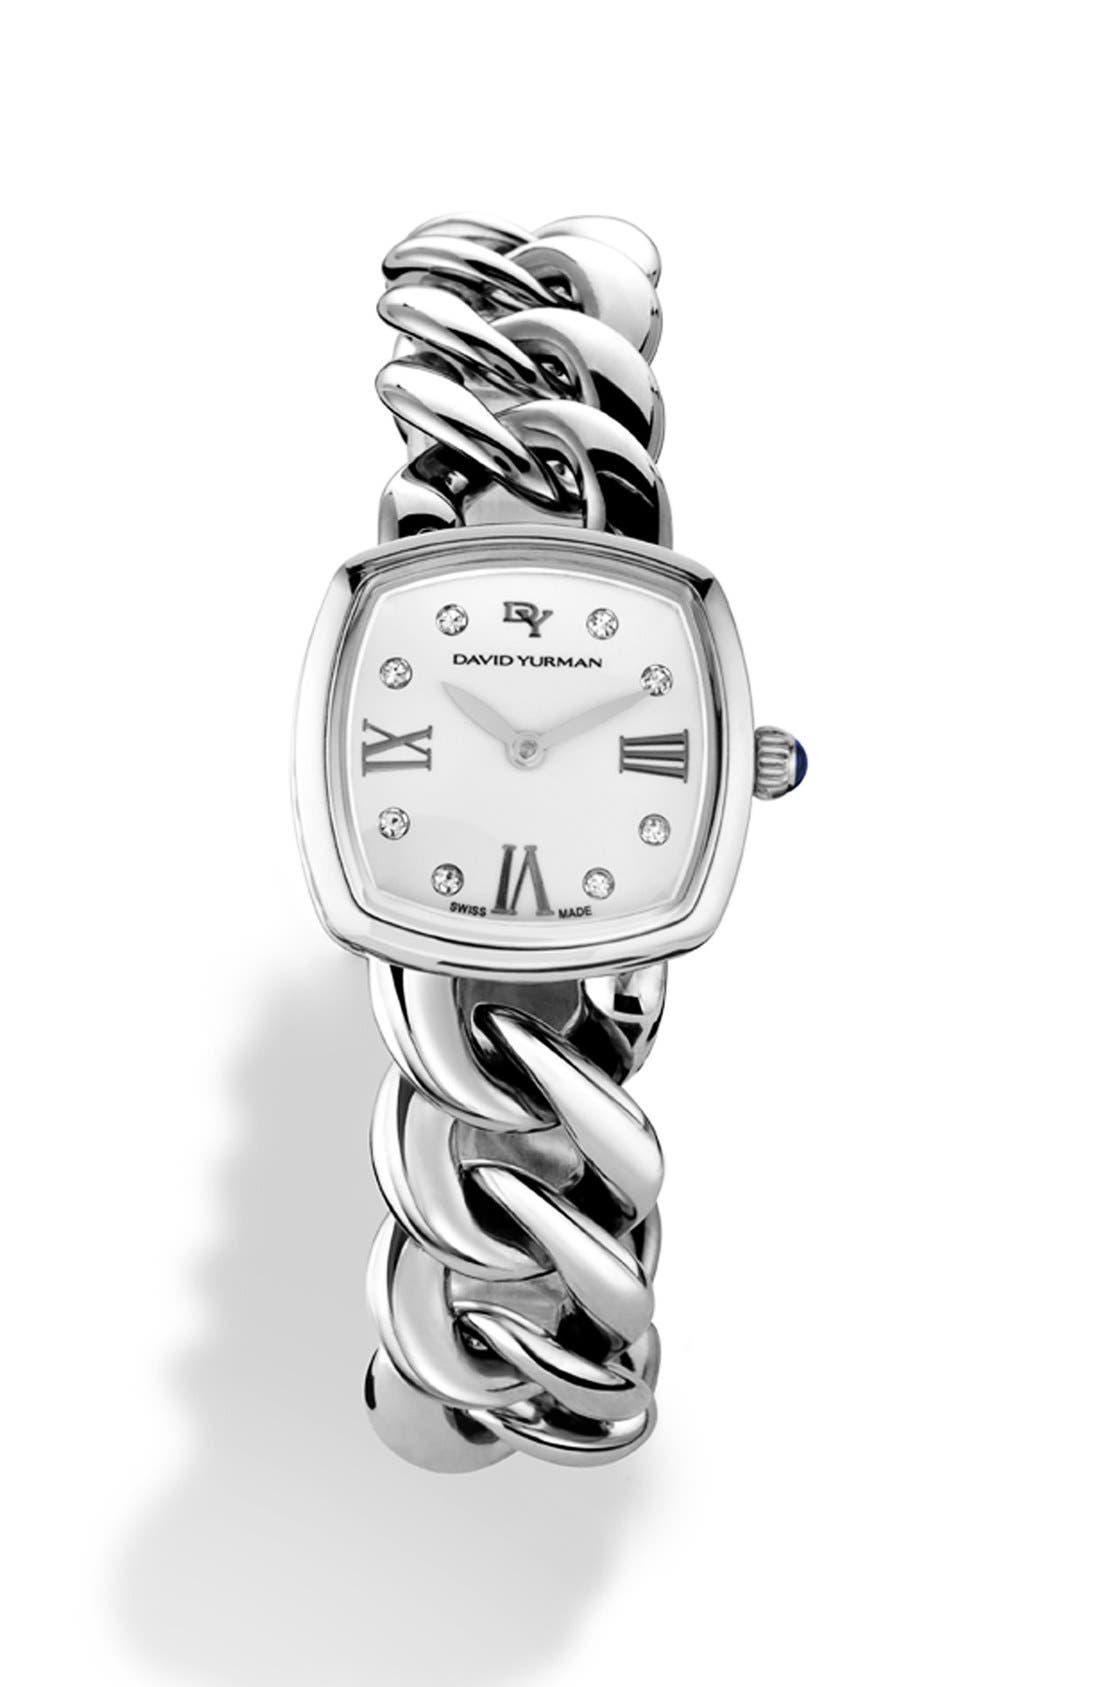 Main Image - David Yurman 'Albion' 23mm Stainless Steel Quartz Watch with Diamonds